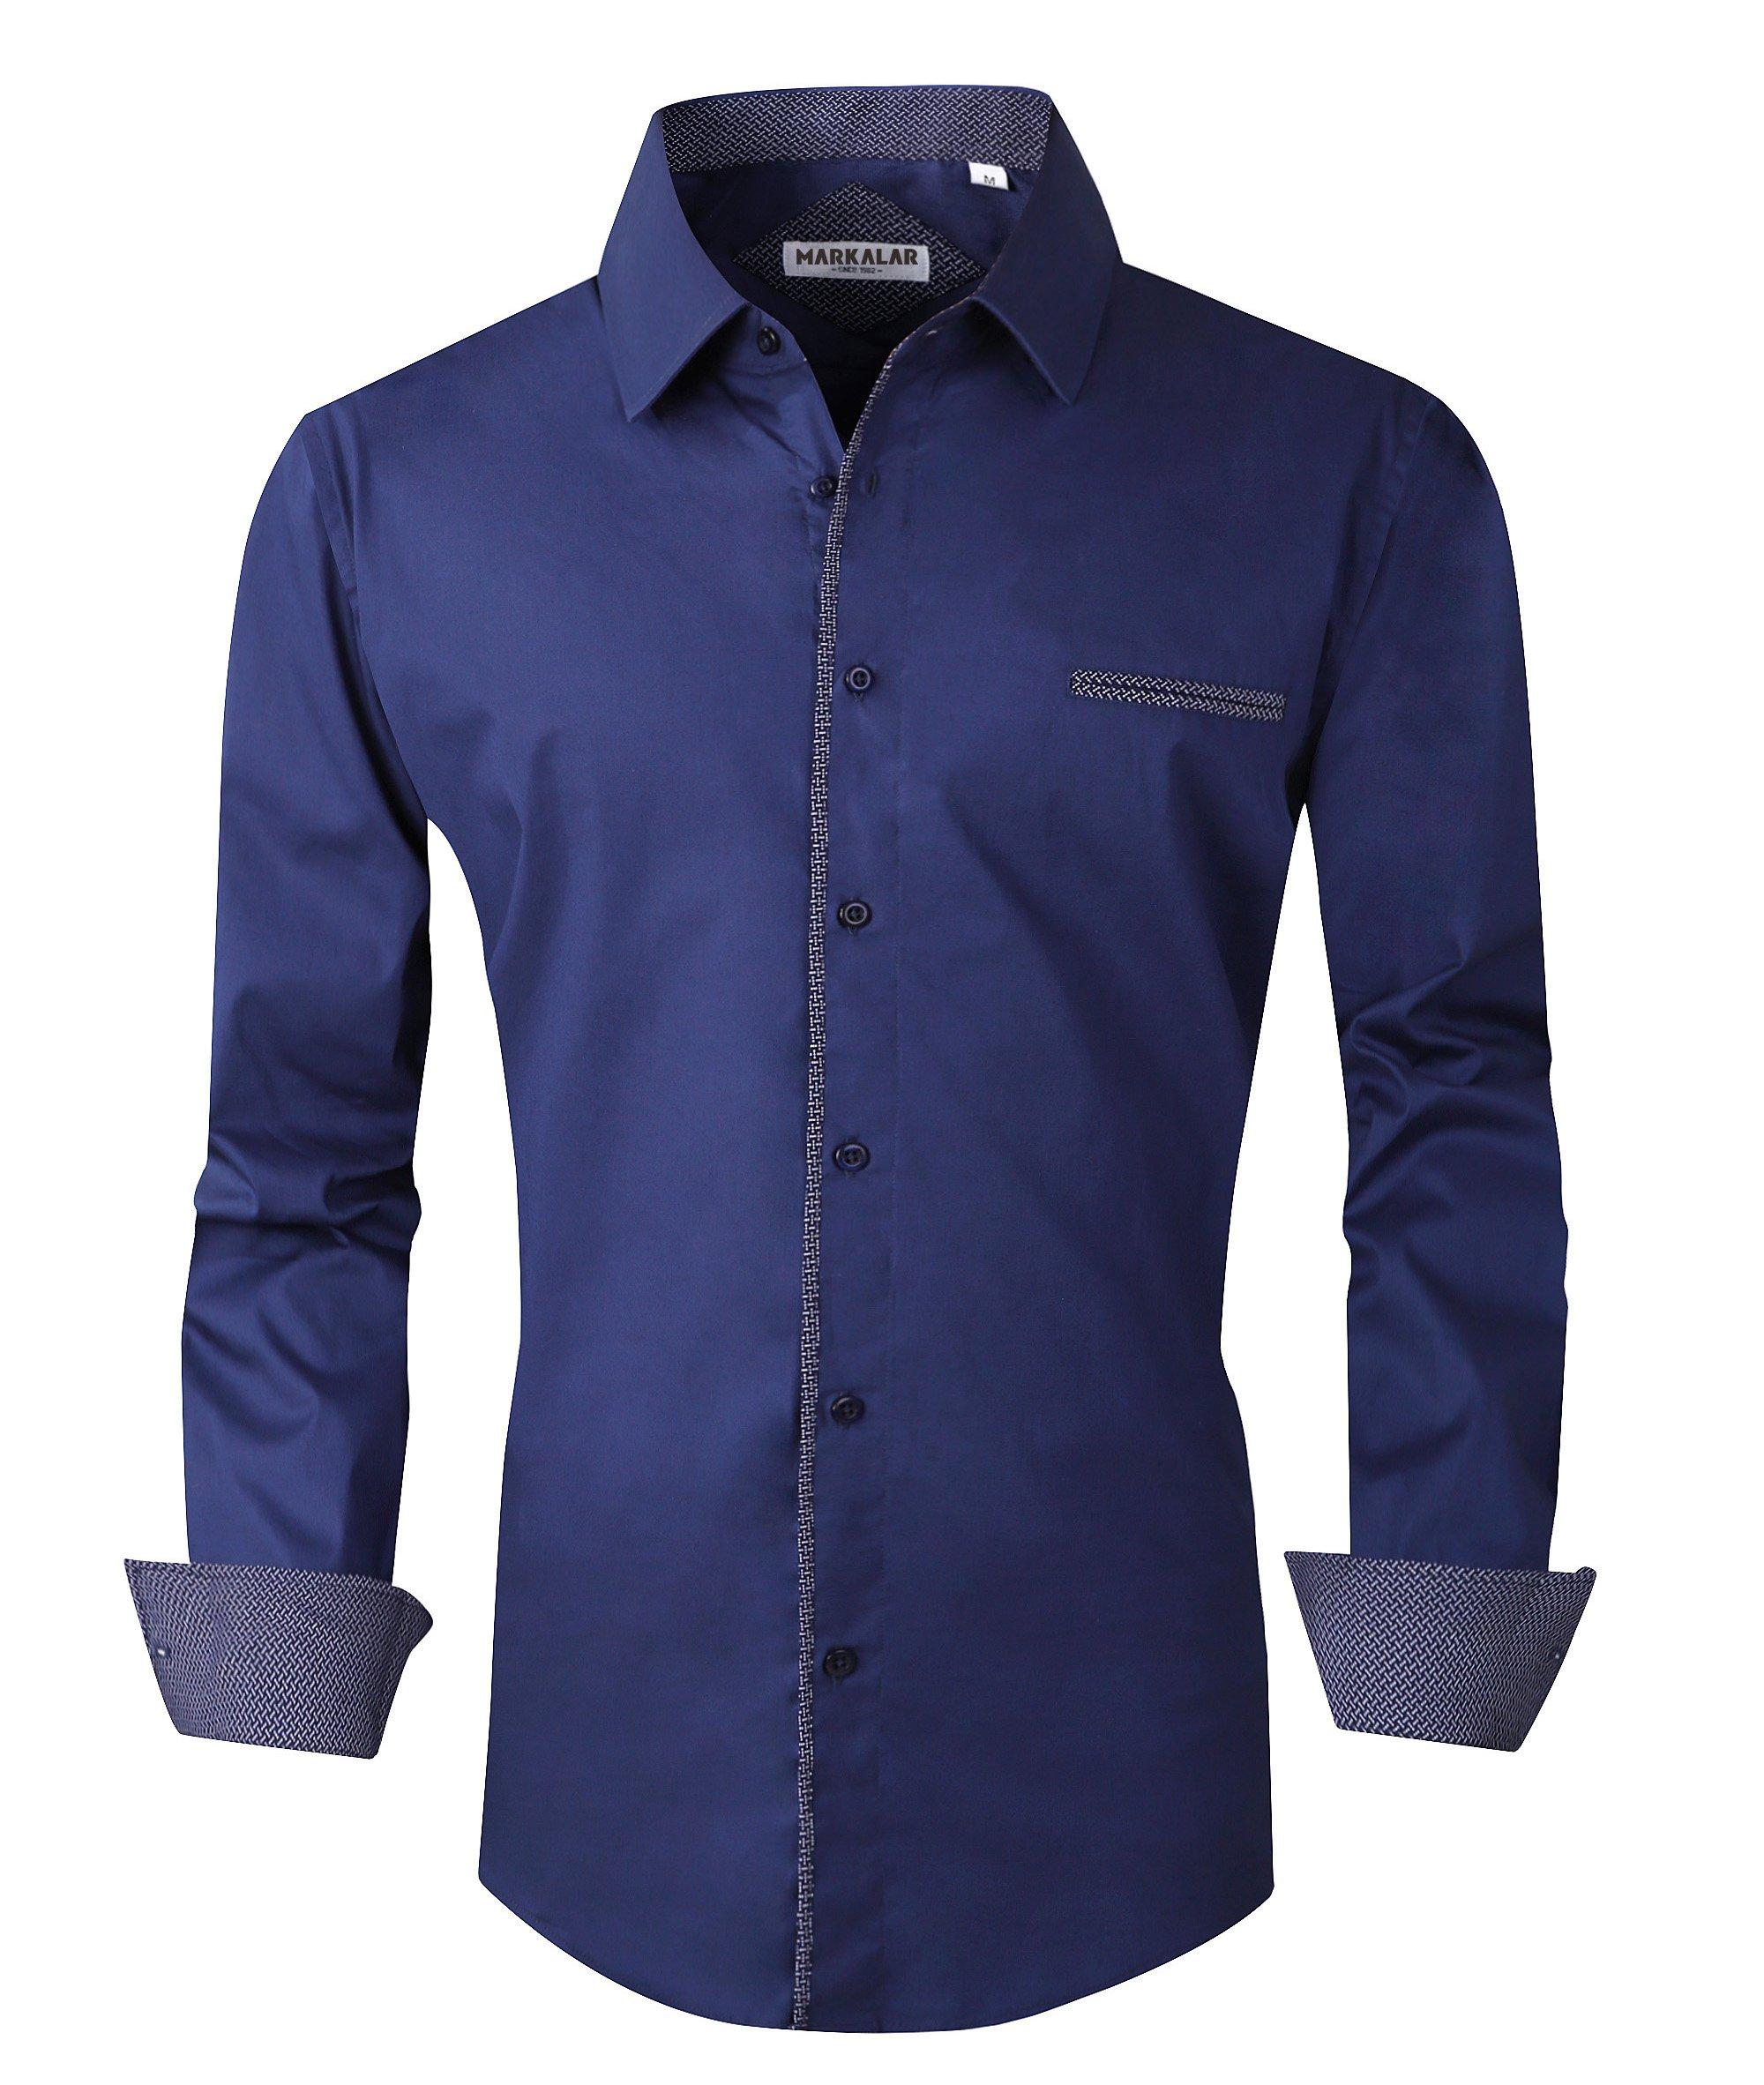 Mens Button Down Shirts Regular Fit Long Sleeve Cotton Casual Dots Dress Shirts,DarkBlue,XXL